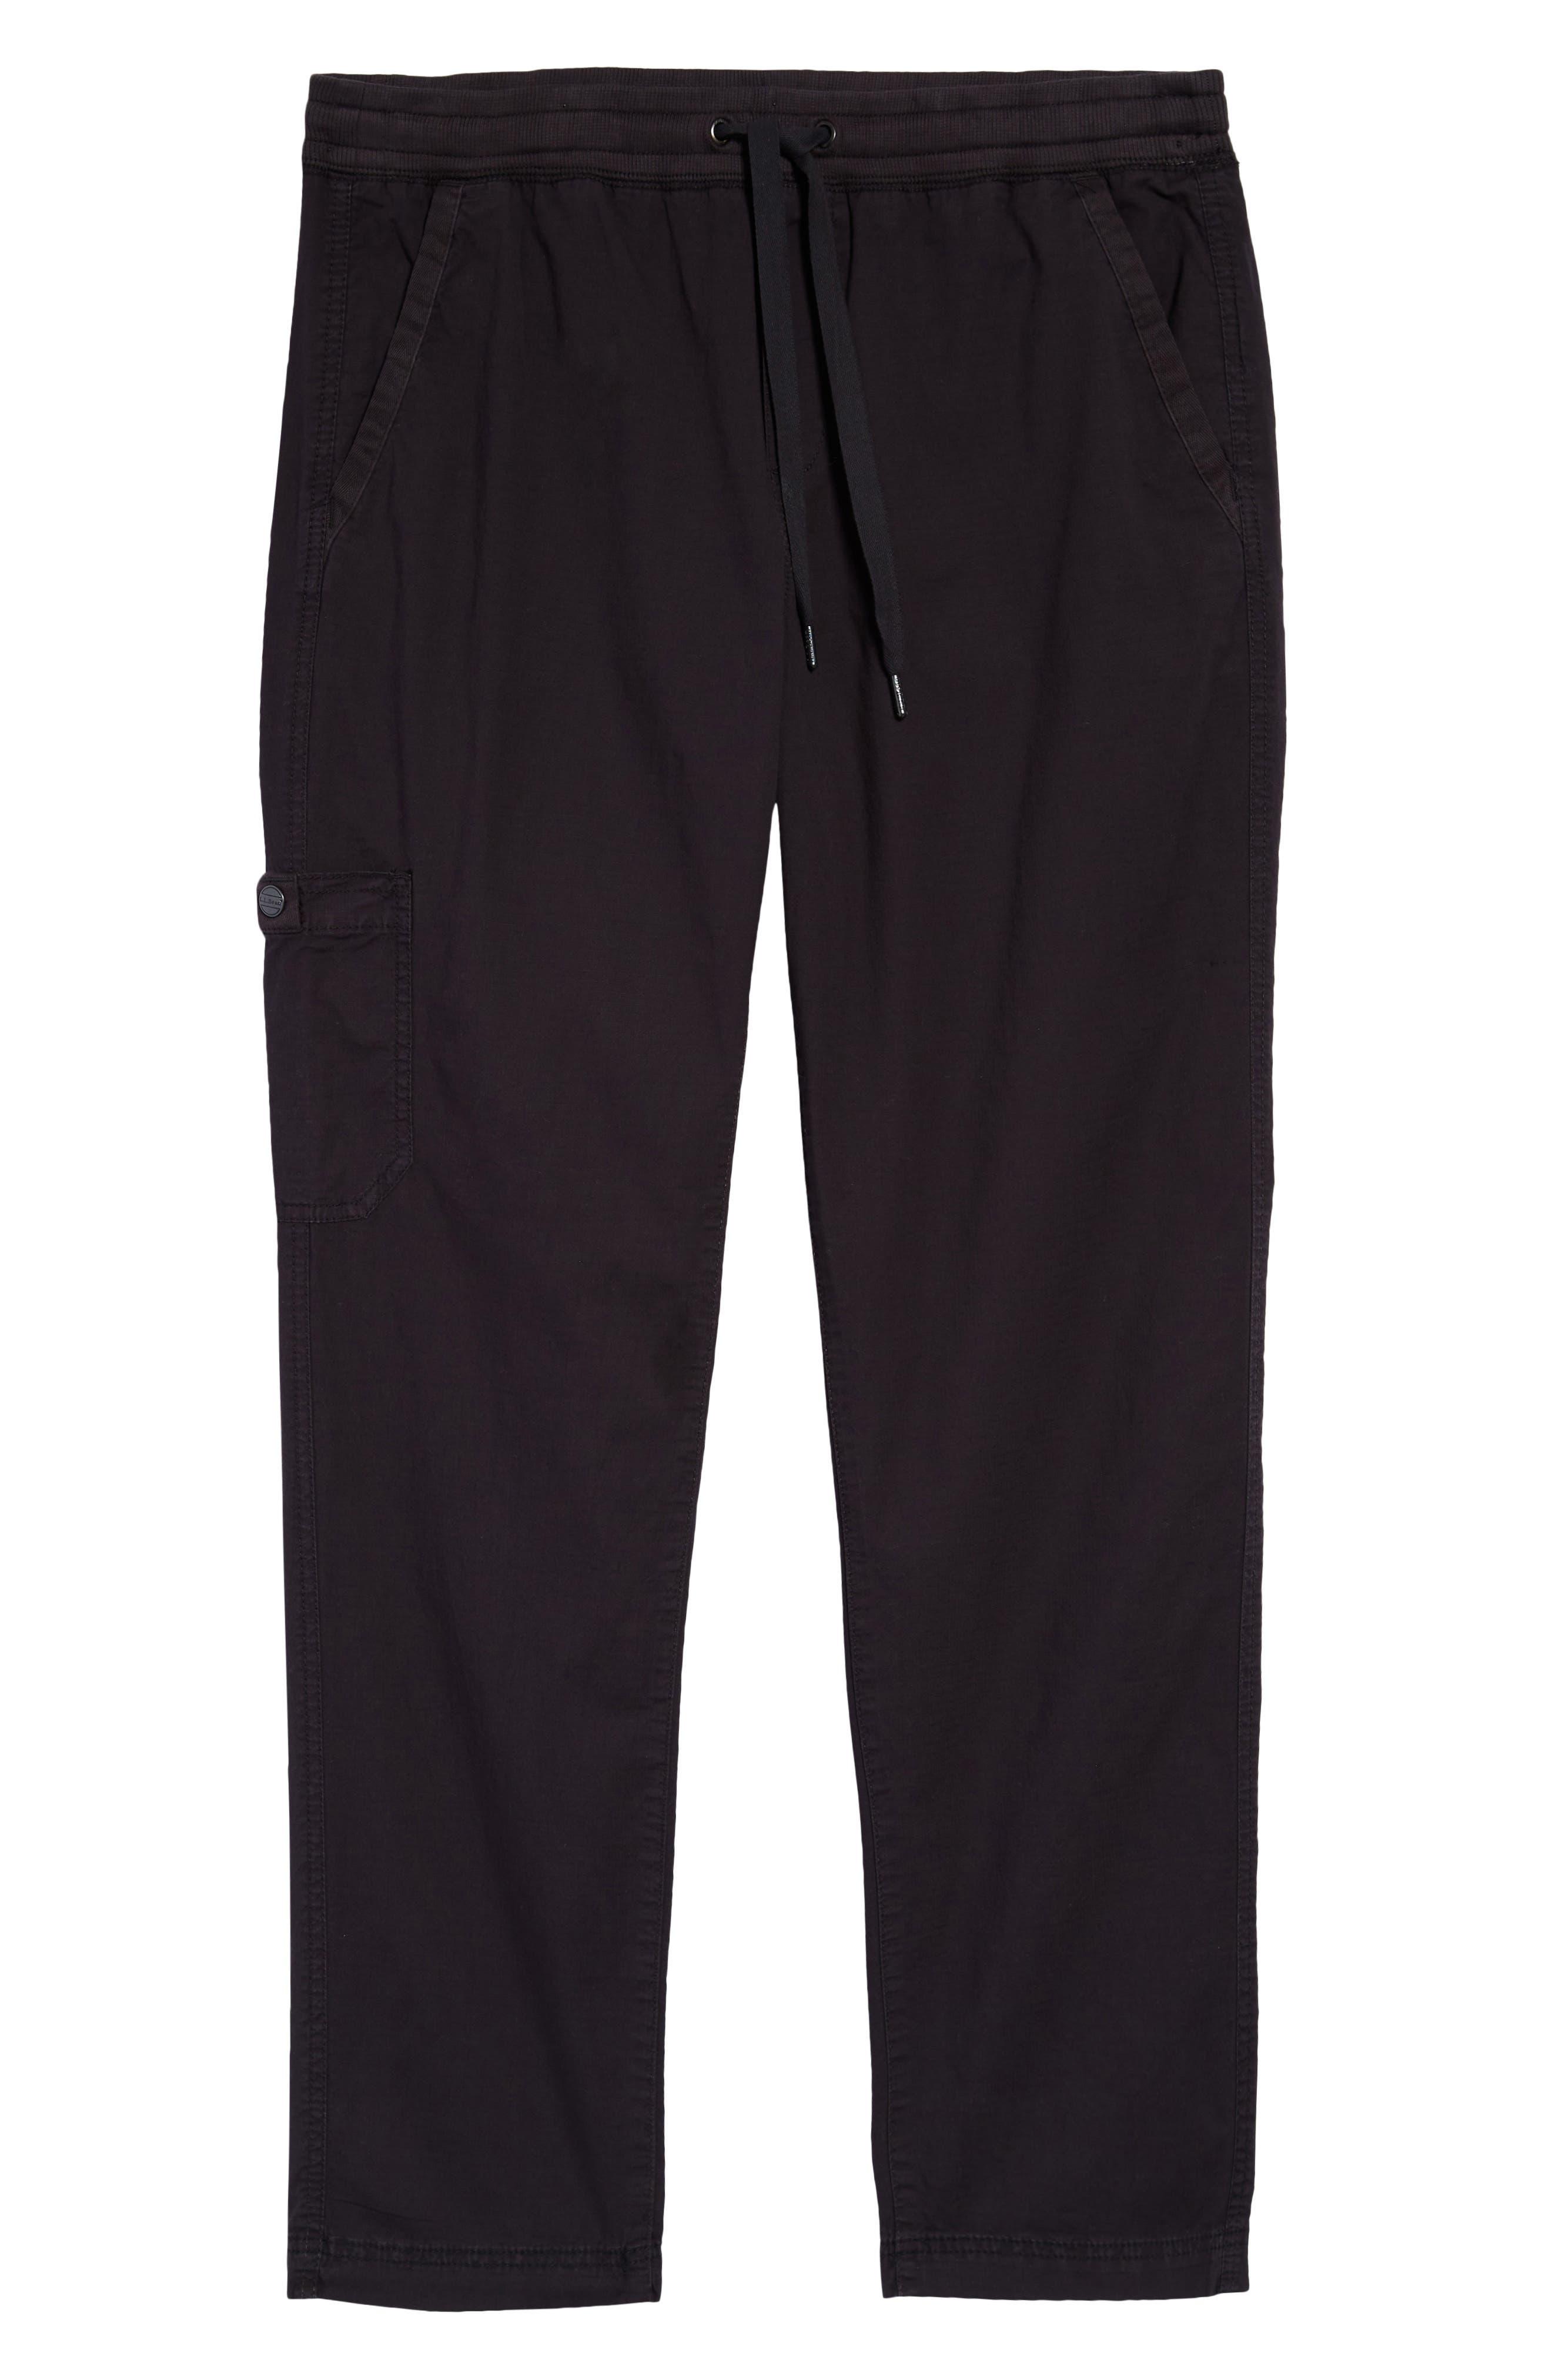 Women's Ripstop Pull-On Pants